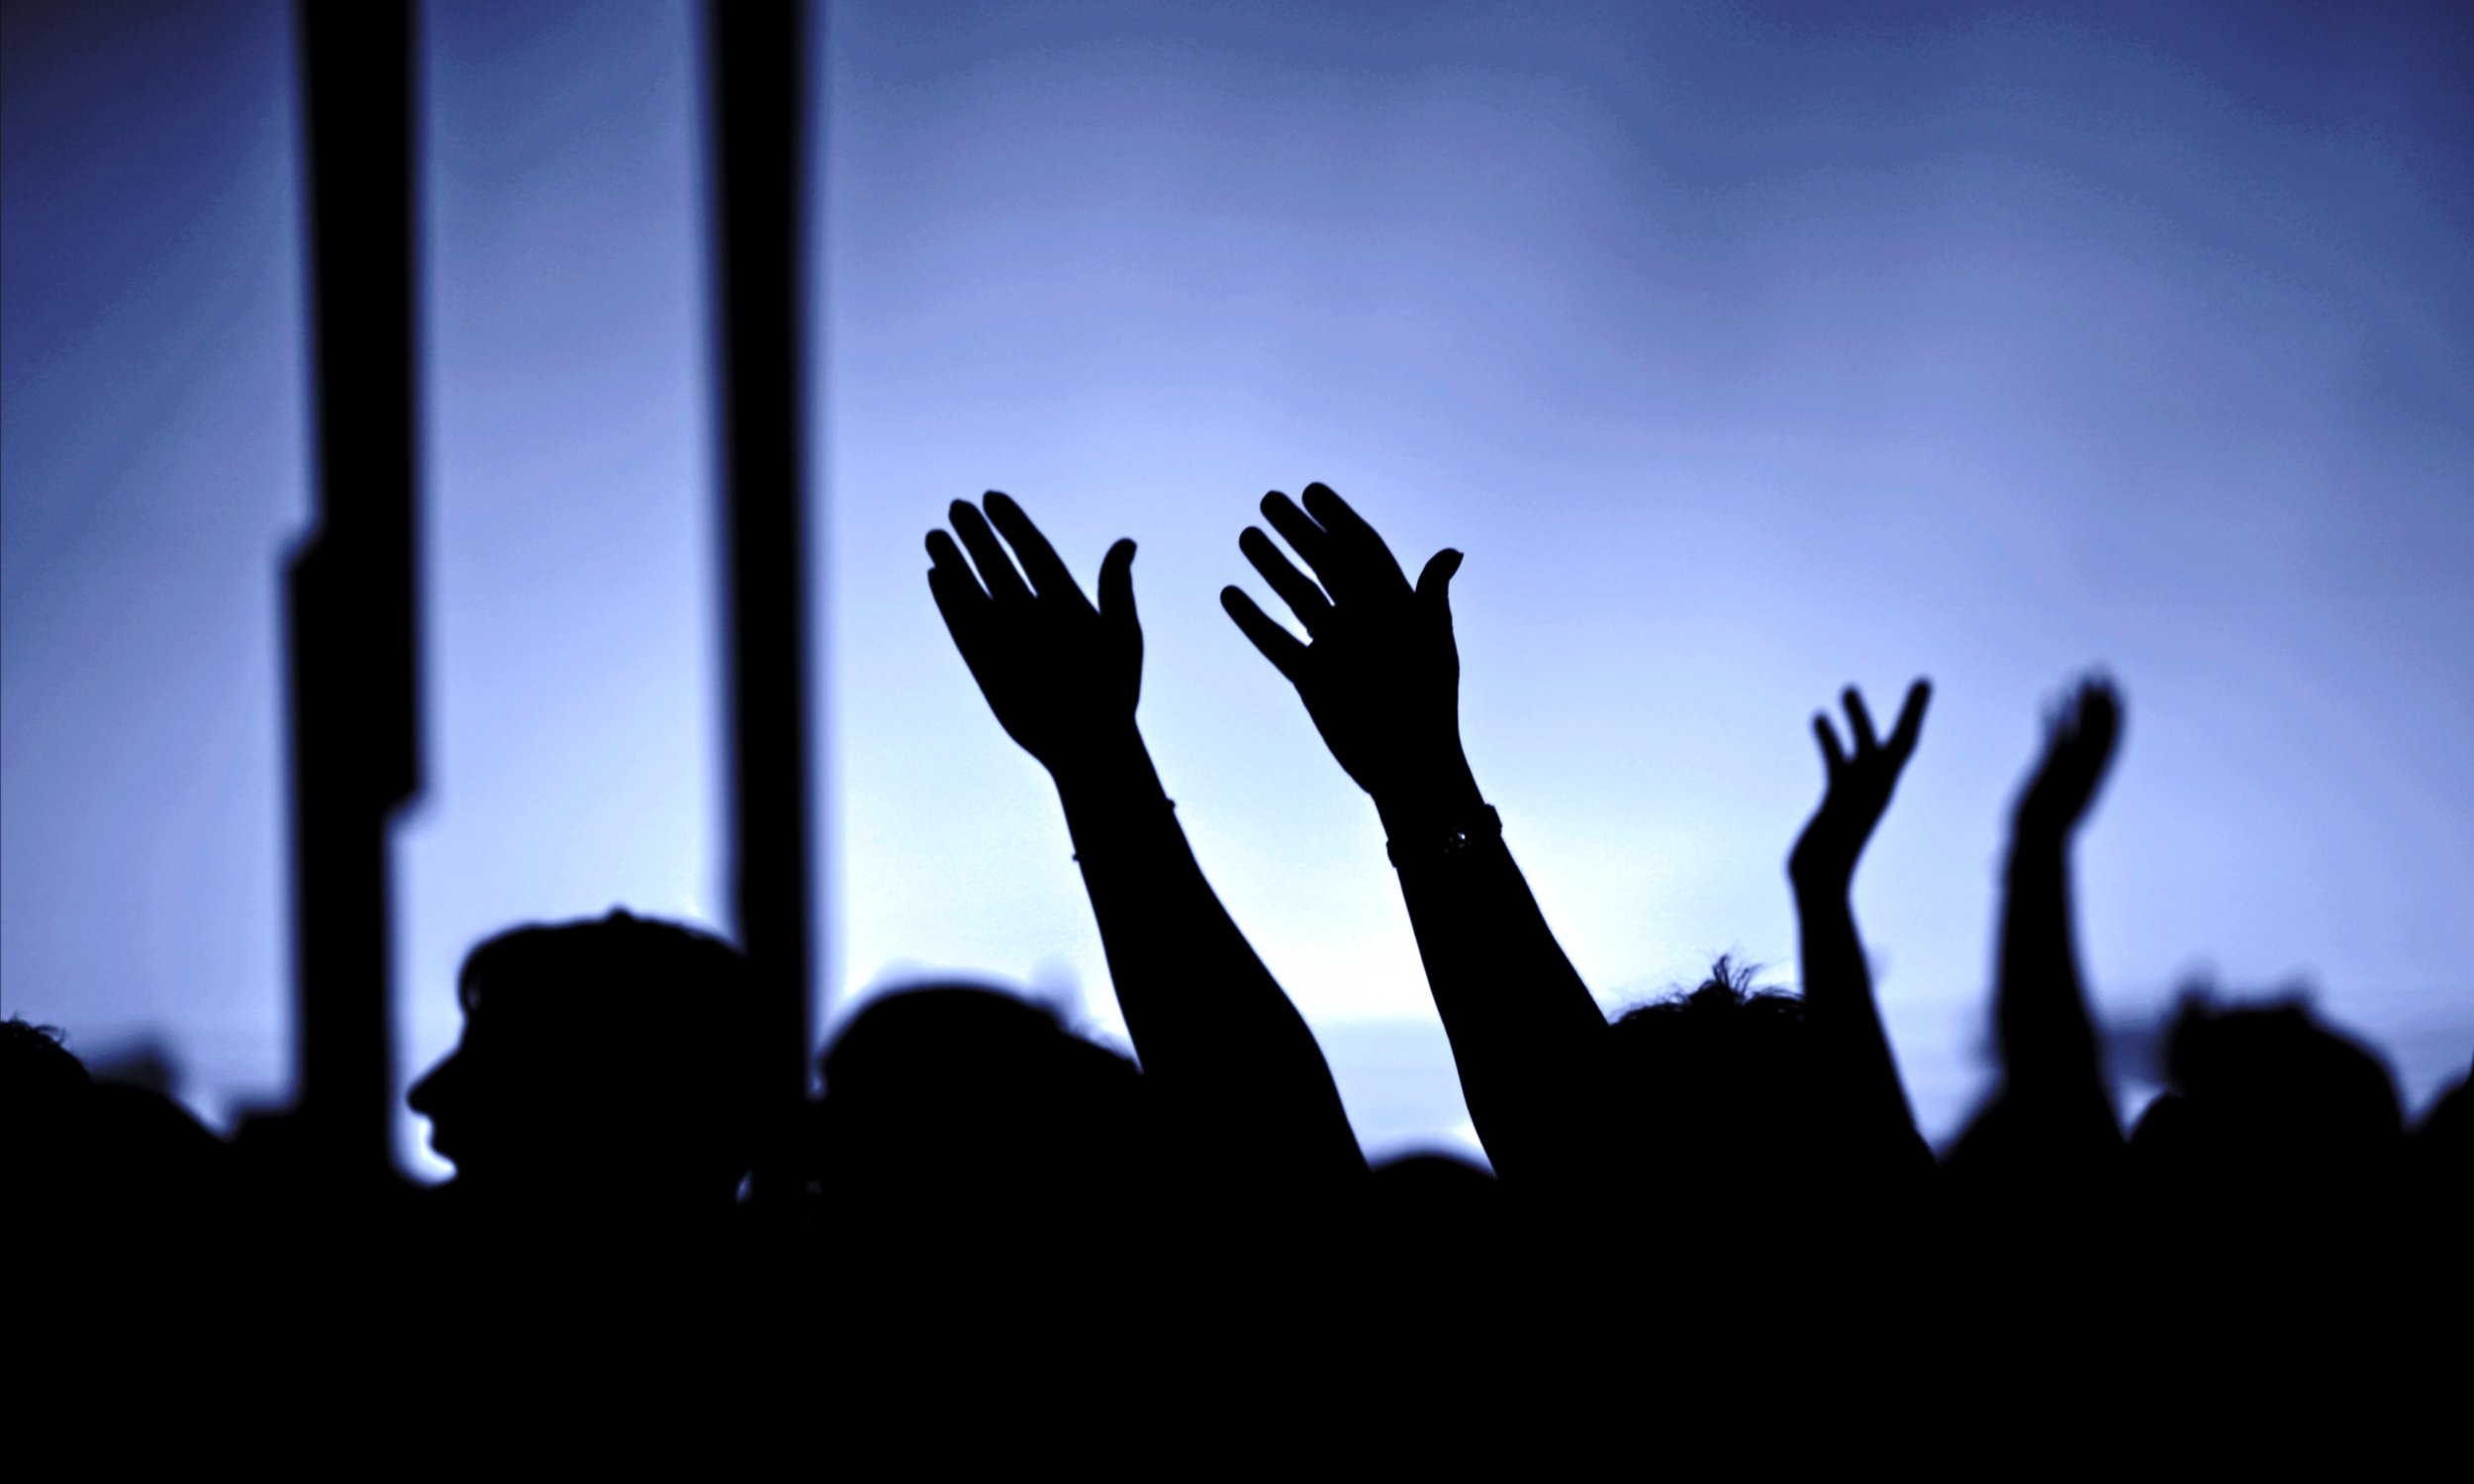 hands-raised.jpg